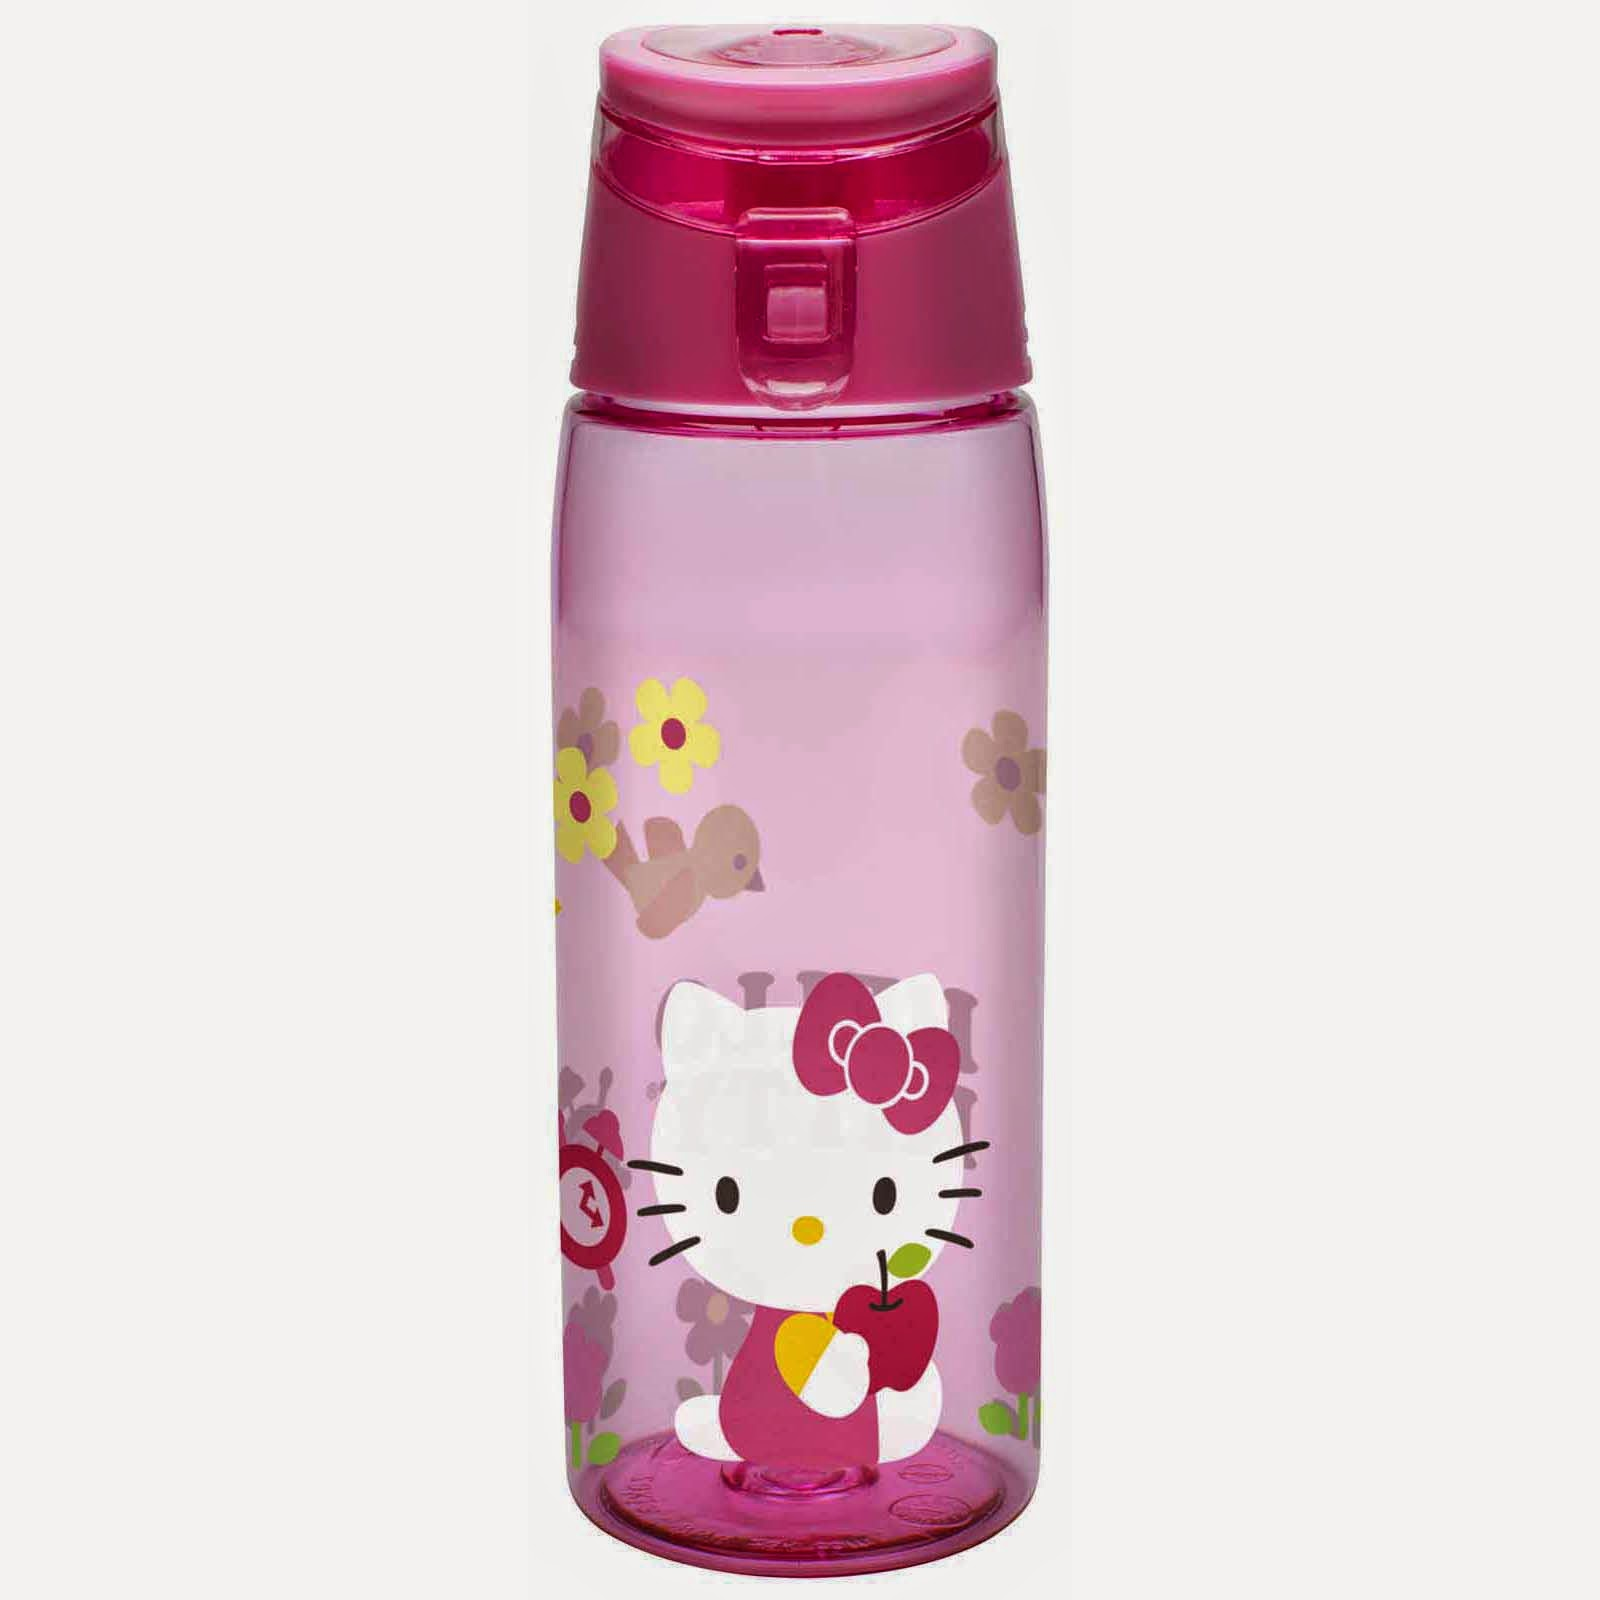 Gratis gambar botol minum hello kitty untuk anak